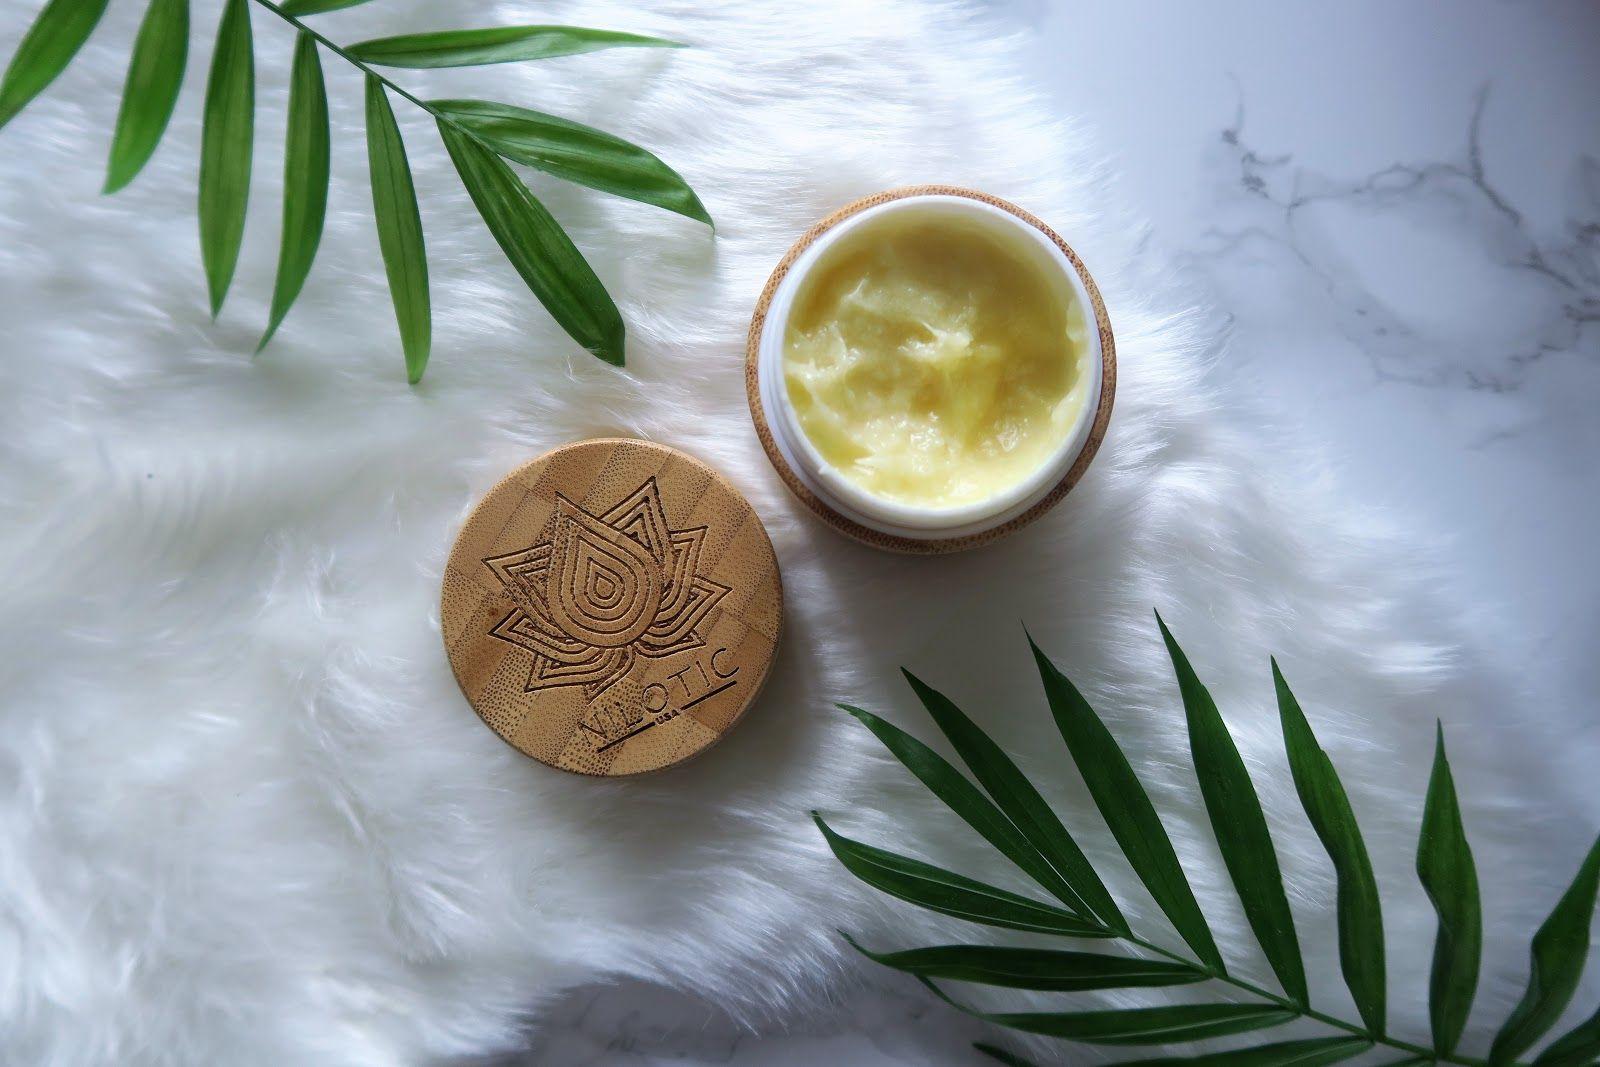 Ana Fernandes Make Up: Nilotic Creme - Pure Shea Fruit Butter